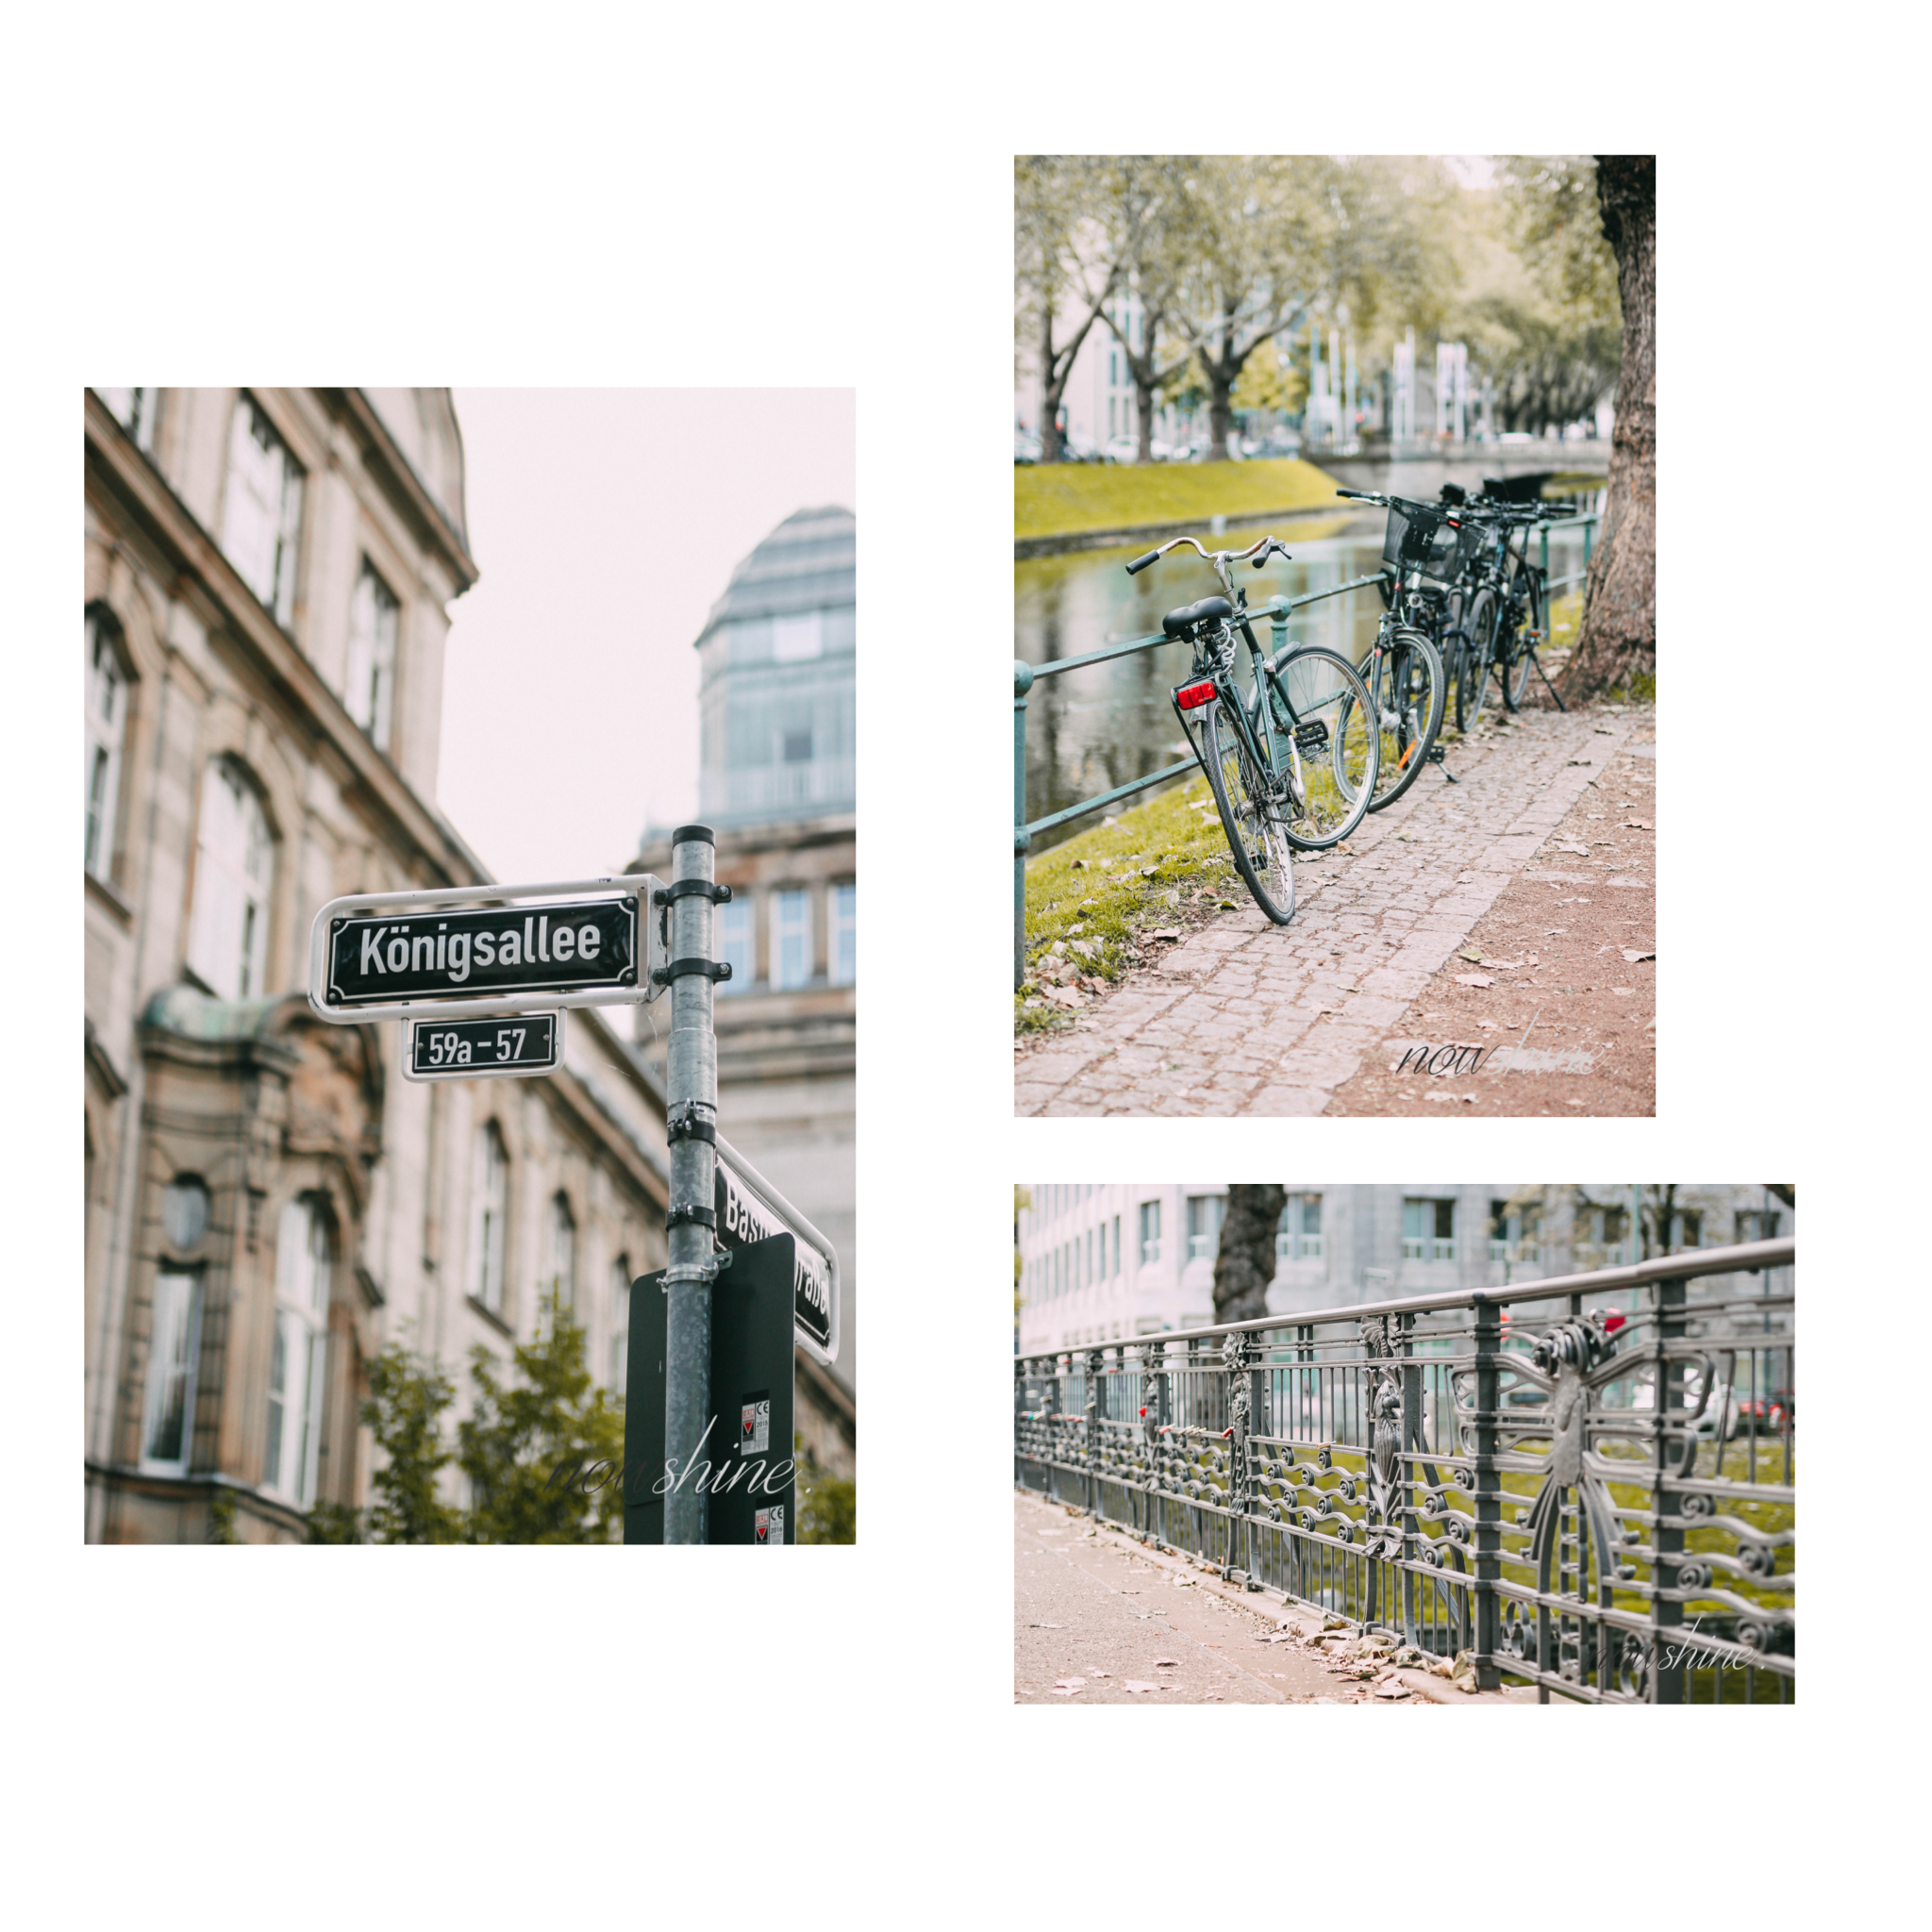 Defense Line von Paula´s Choice - Nowshine Beauty ü40 - my life, my city, my skin Kampagne - Königsallee Düsseldorf